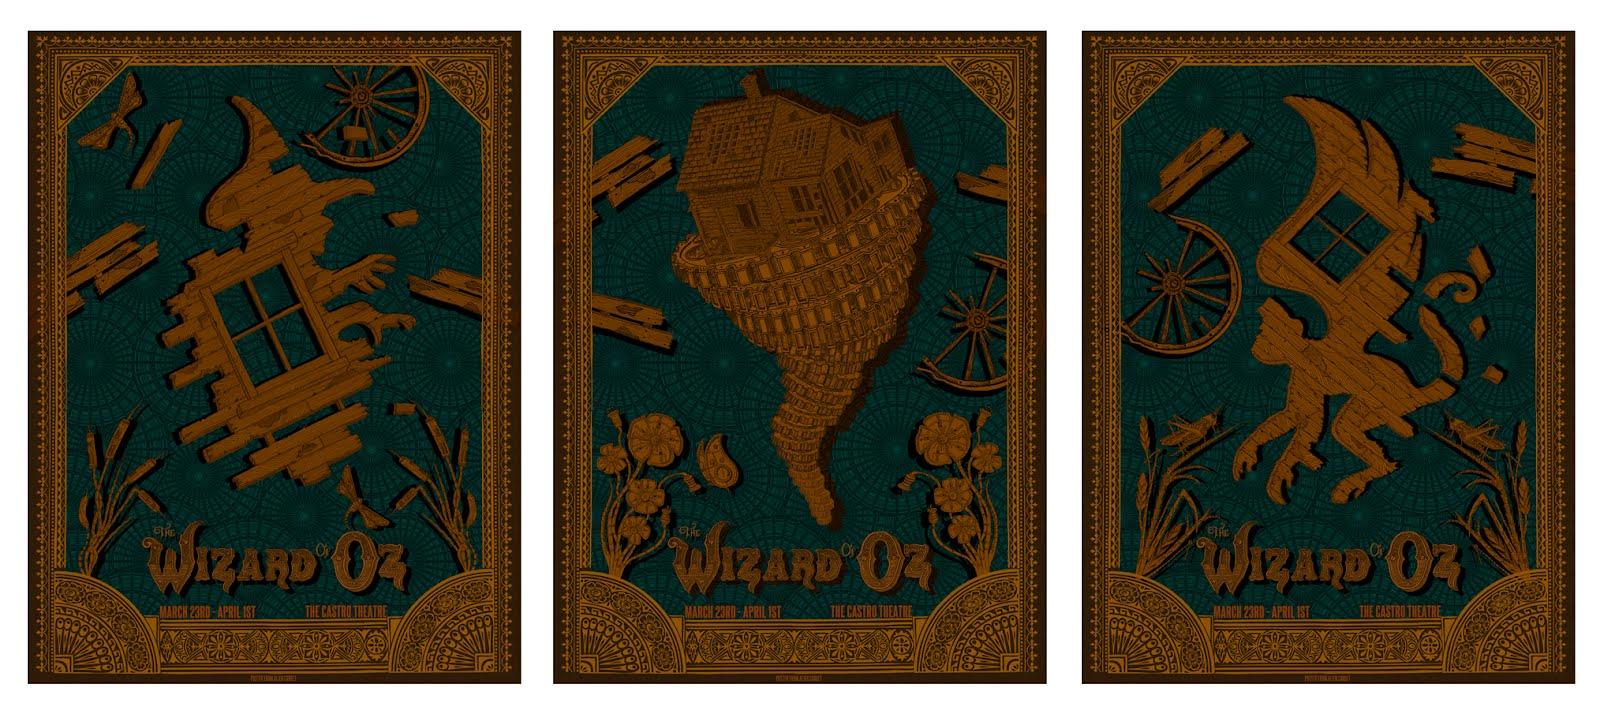 o'daniel the wizard of oz emerald